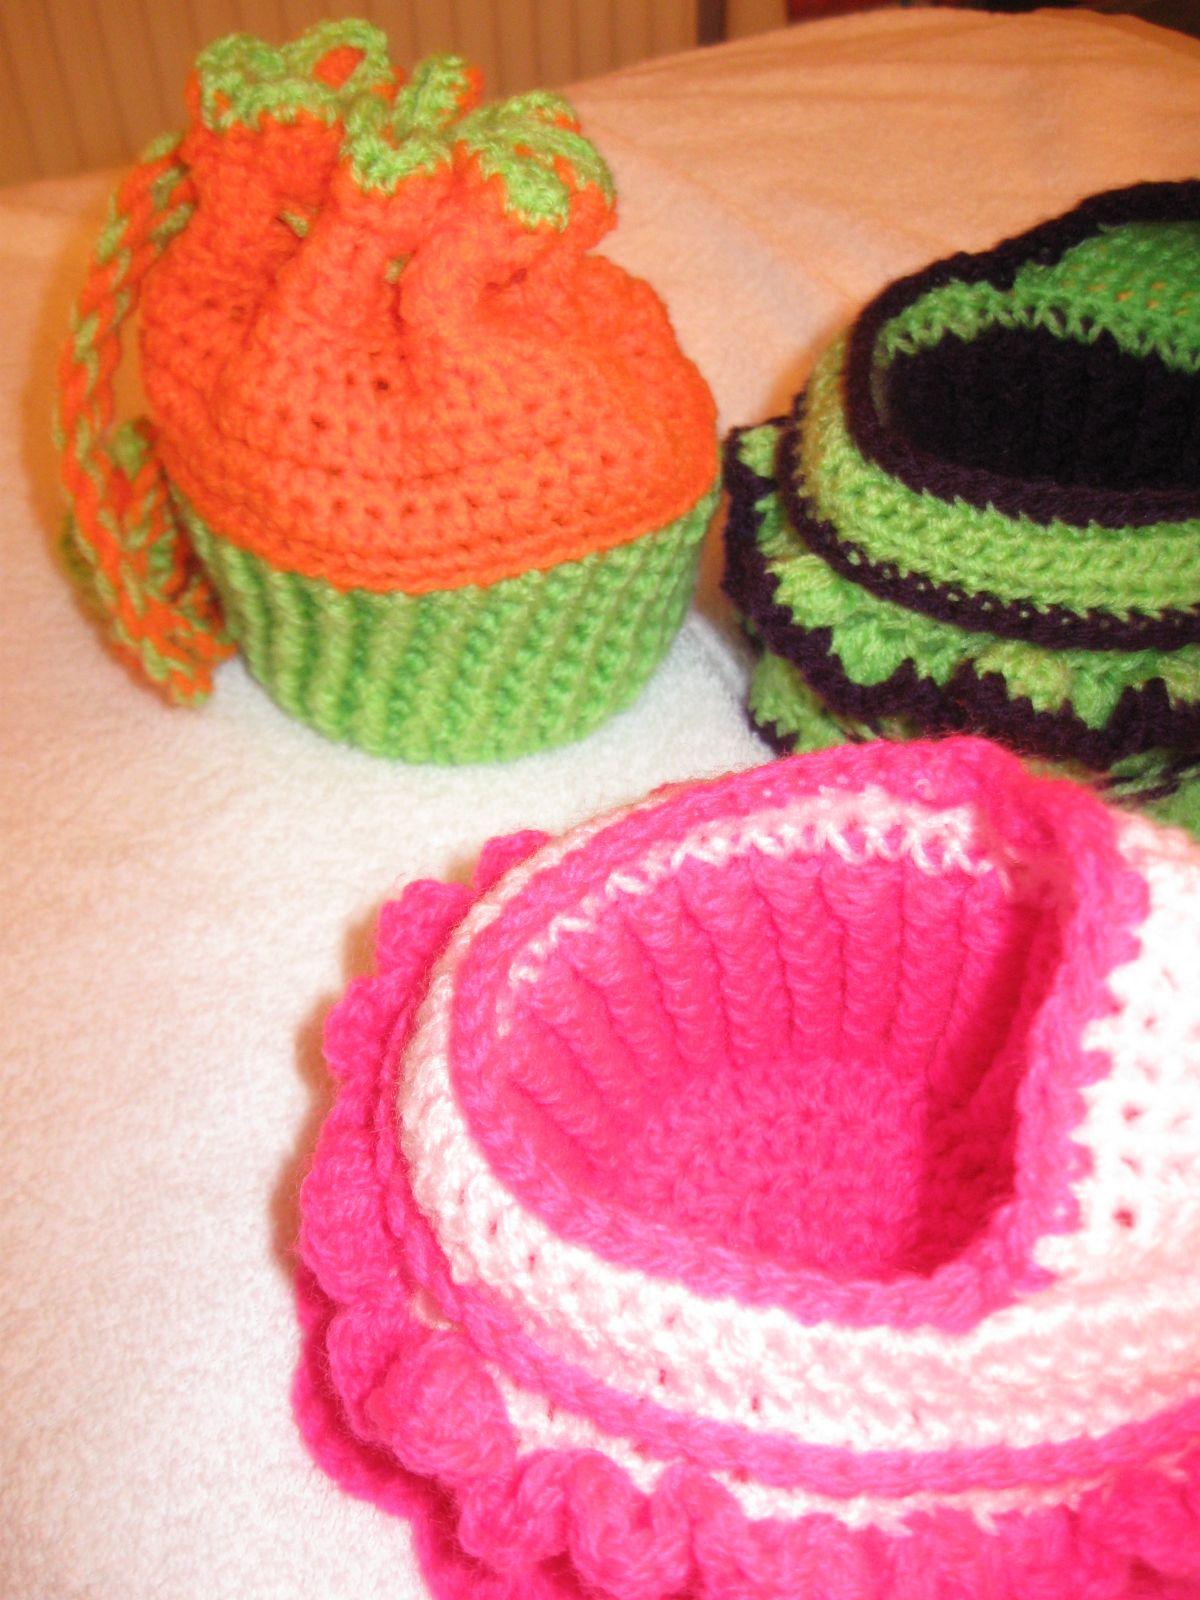 Pattern here .... http://www.crochetville.com/community/topic/78834 ...